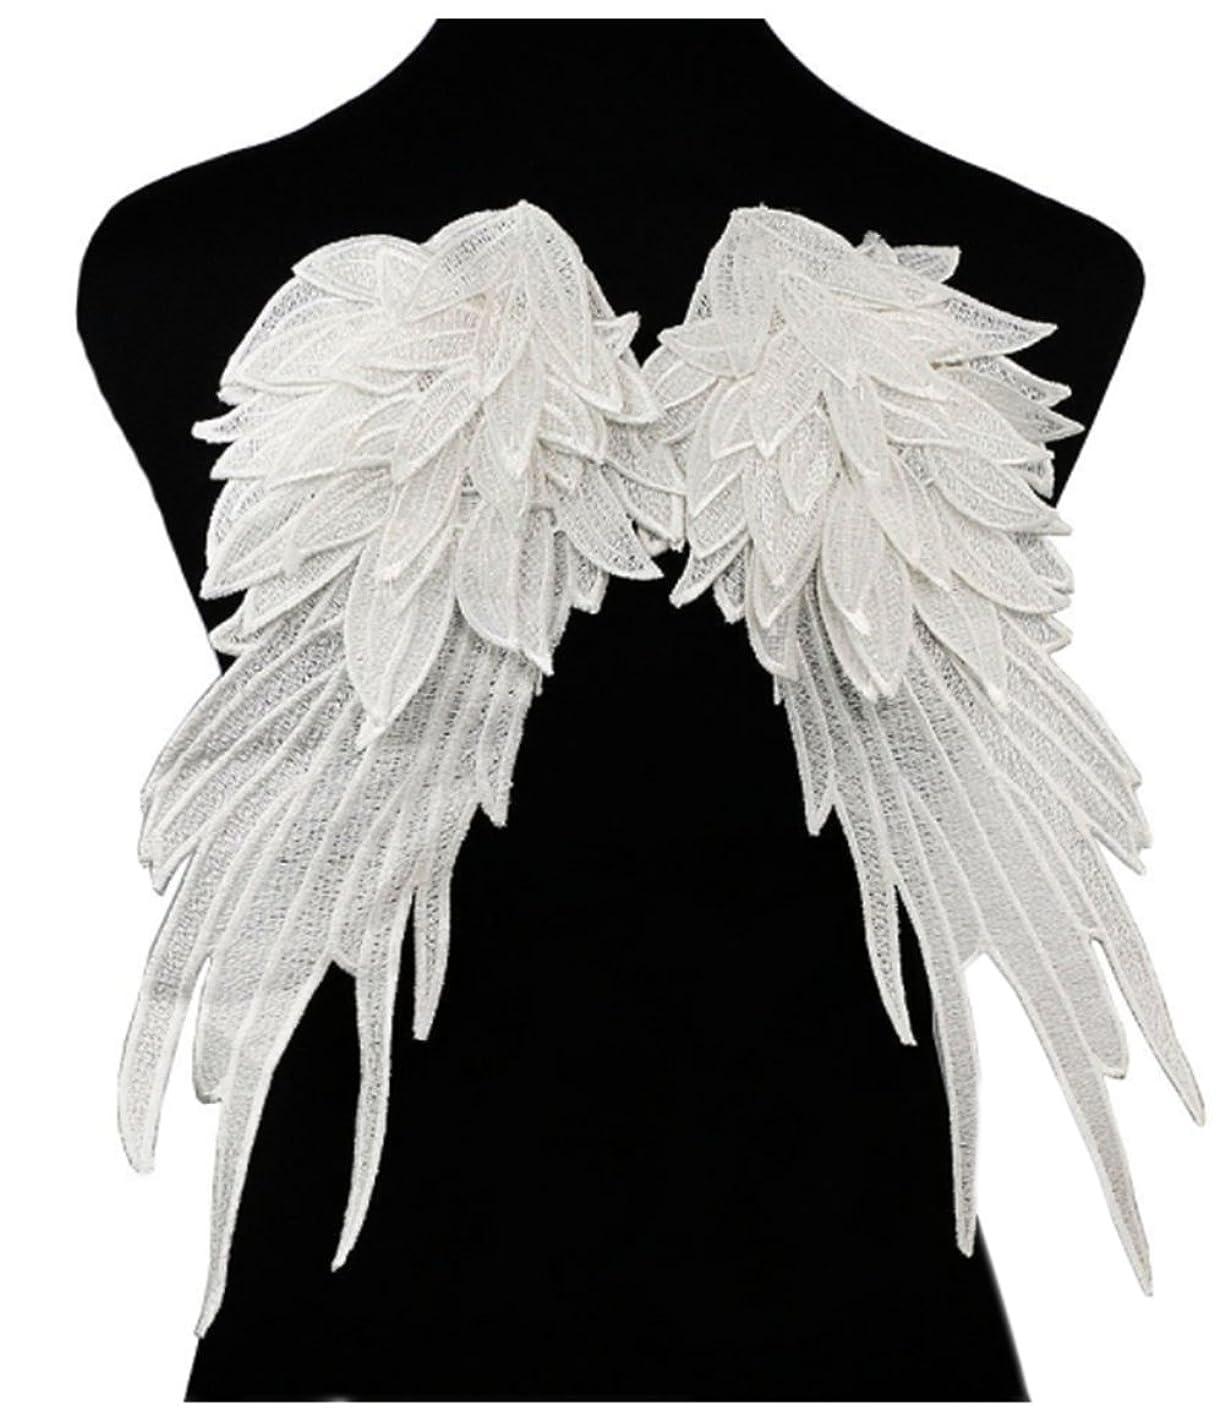 Ancefine Women Sew on Angel Wing Neckline Lace Trim Applique (Large, White)